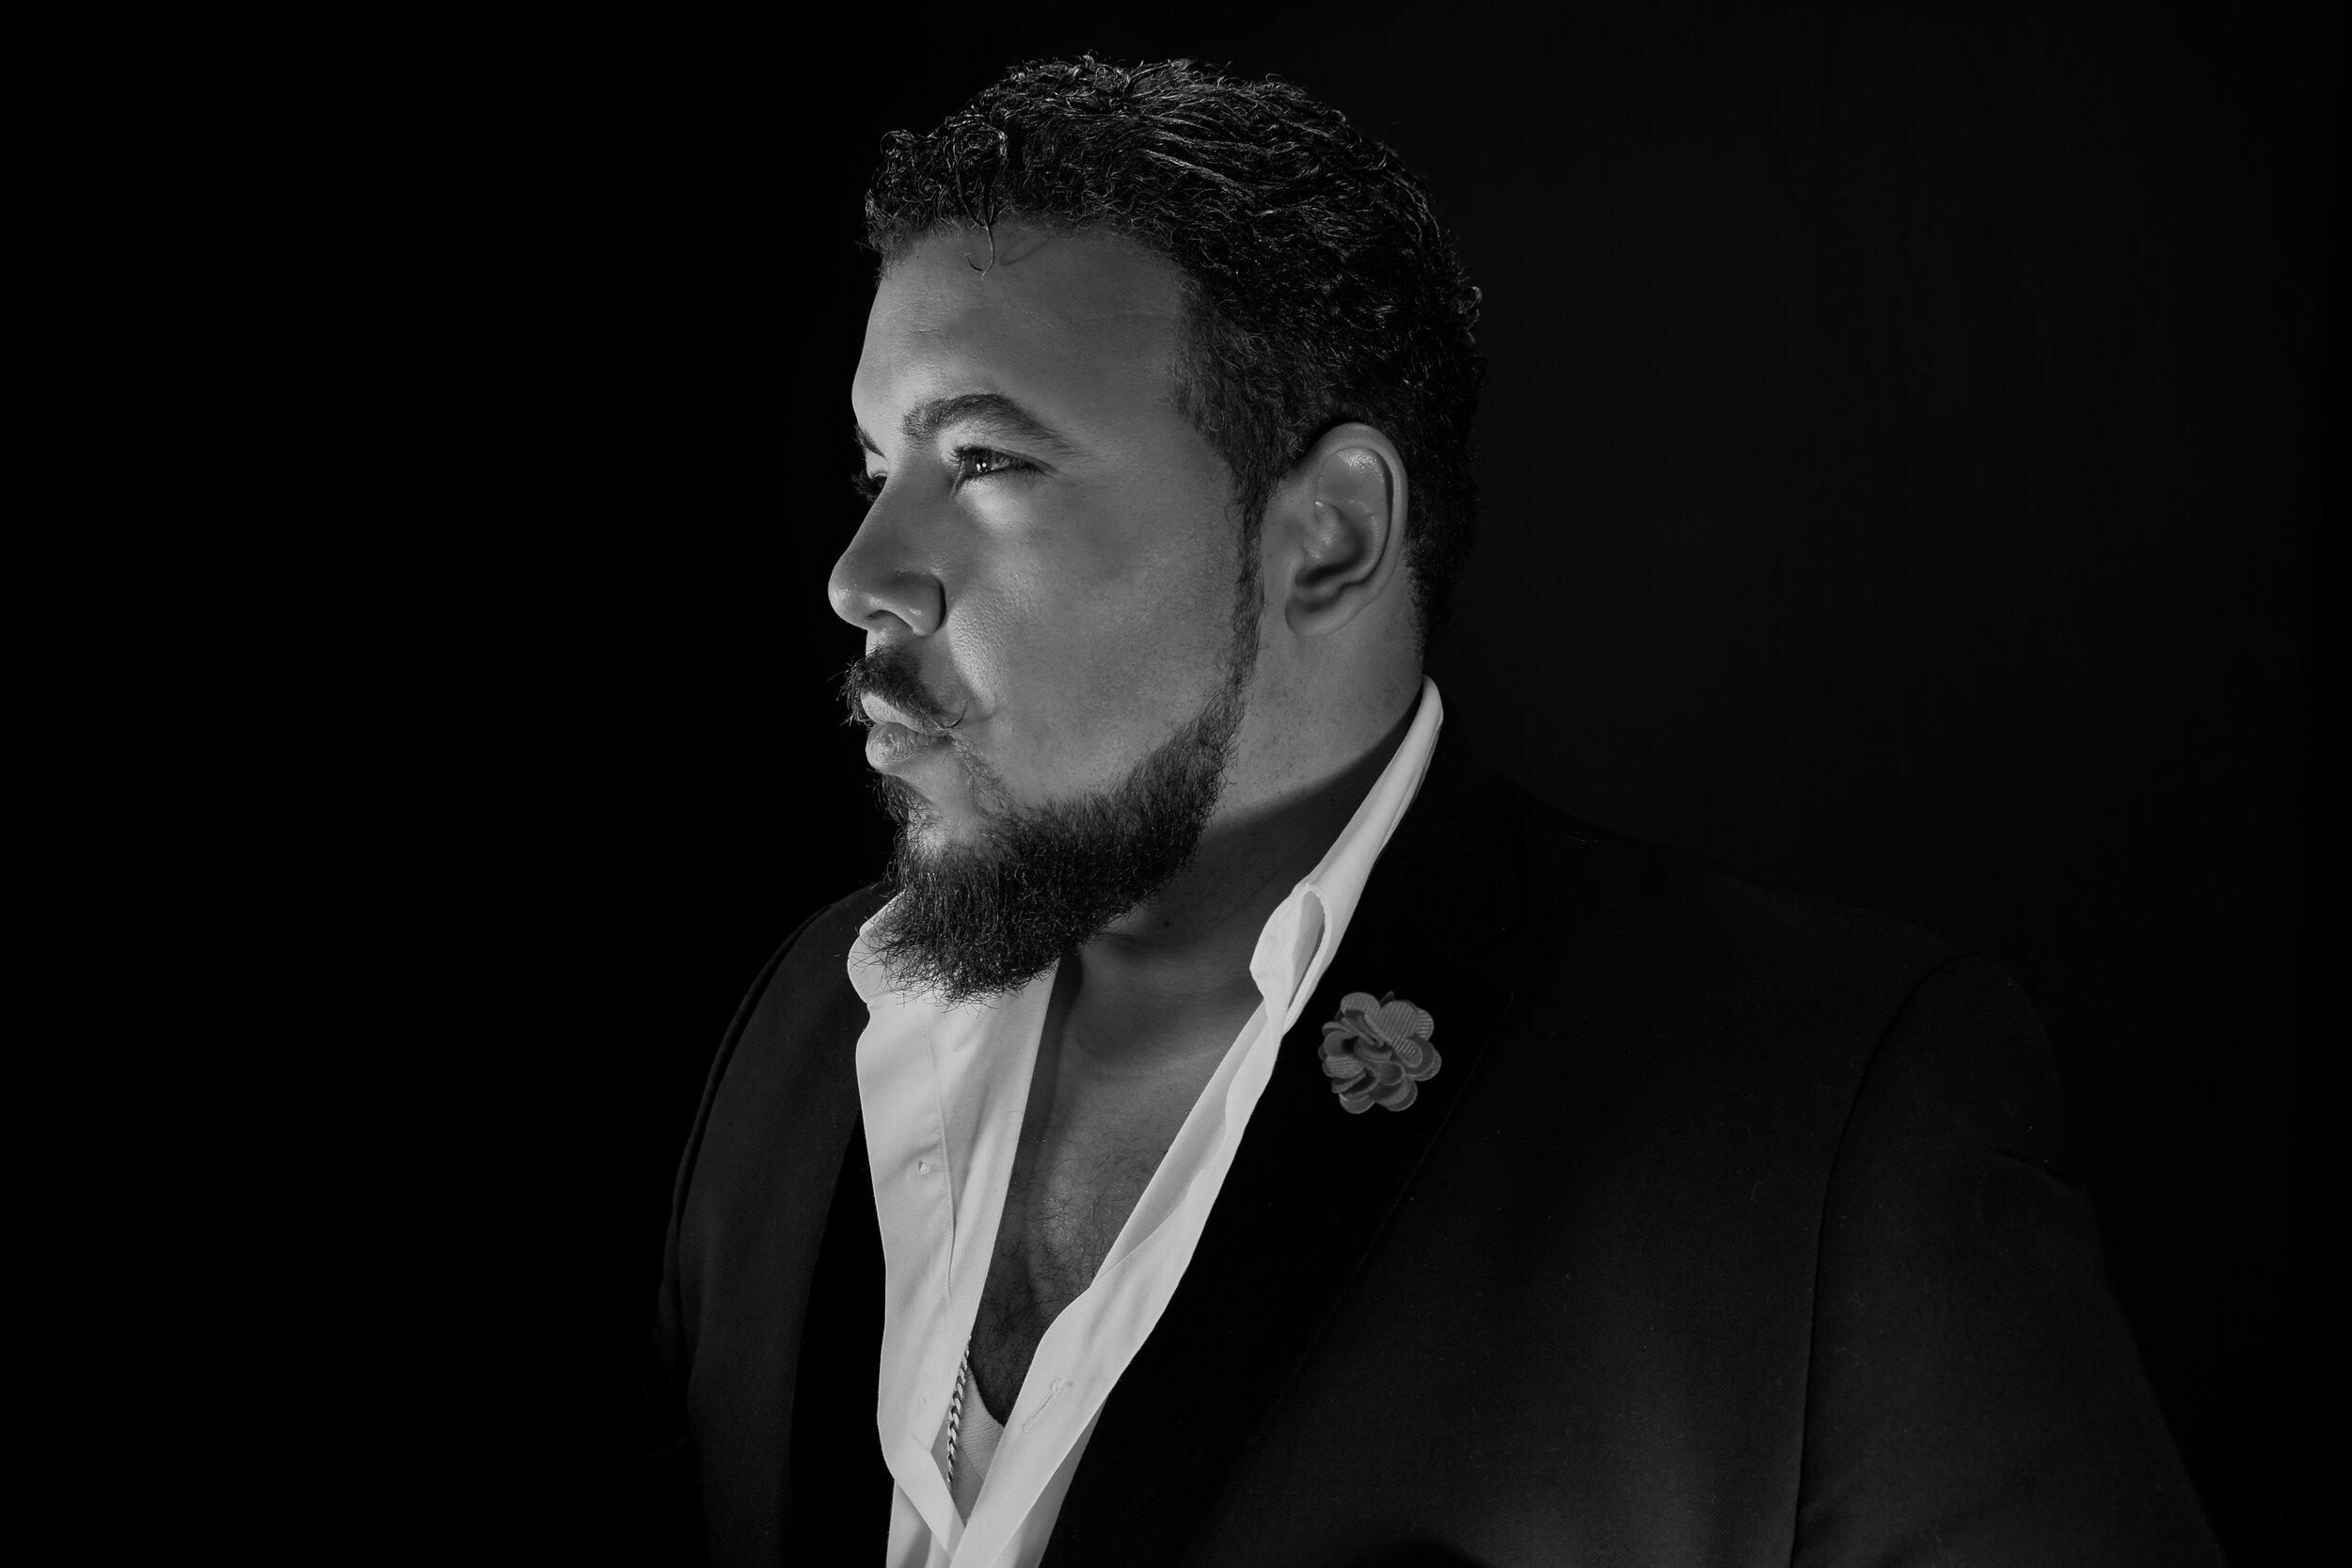 José Heredia Photo by Julián De La Chica